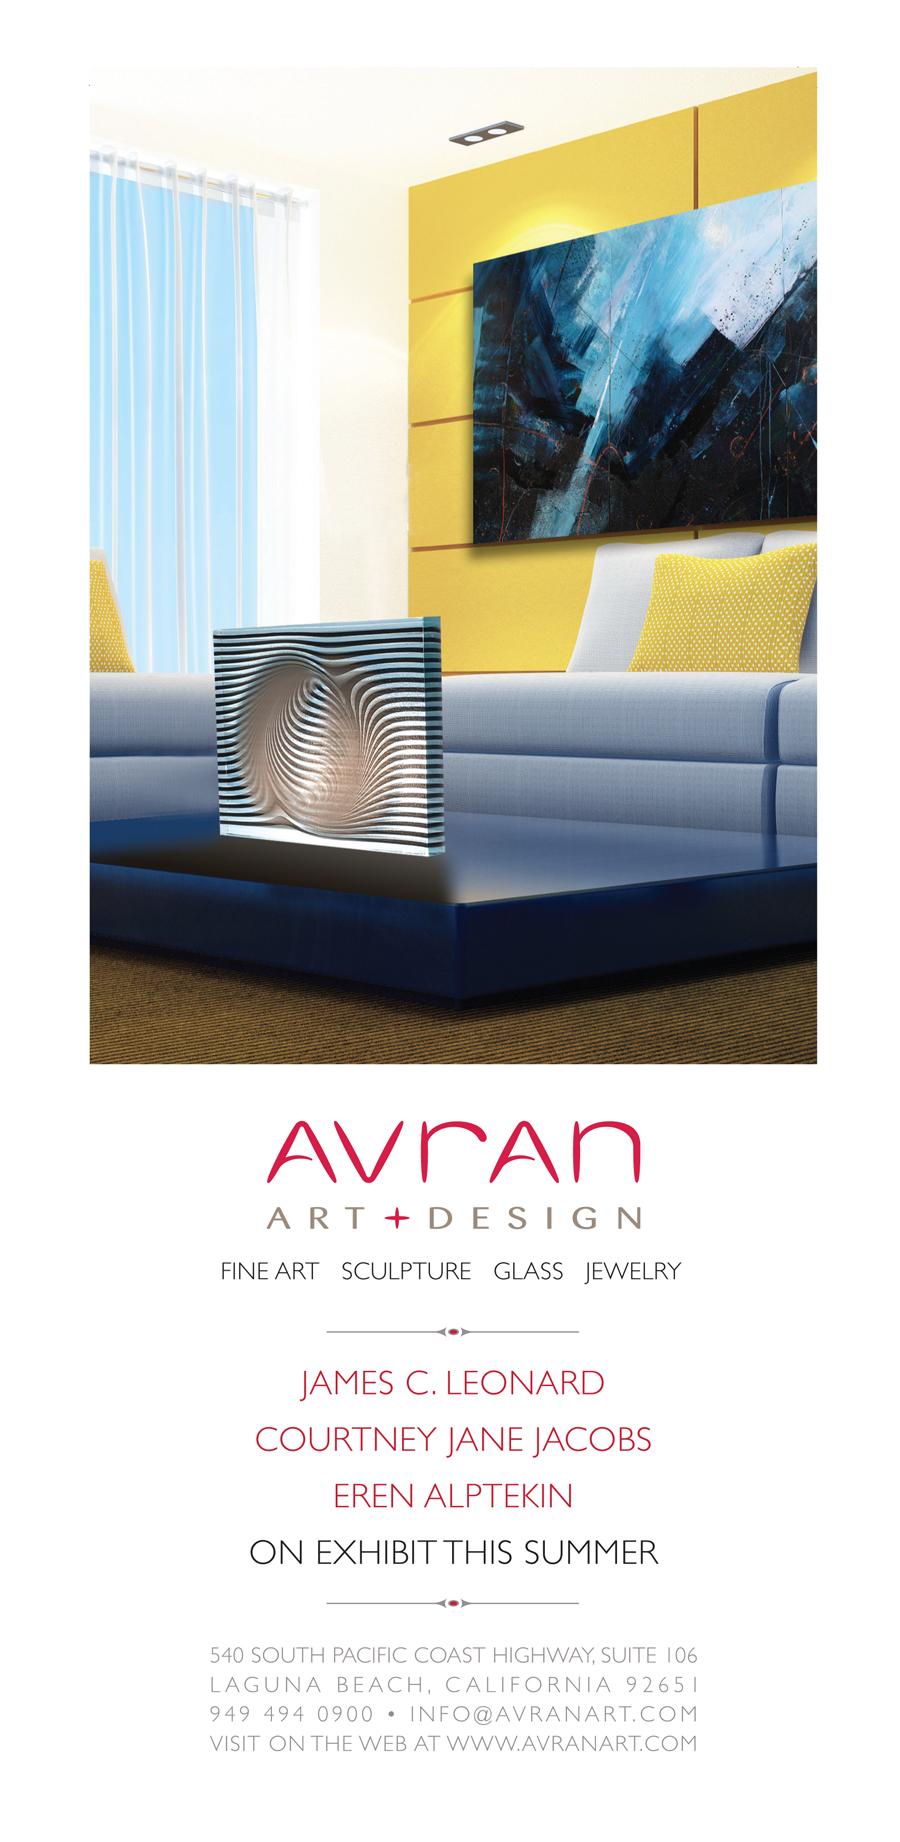 AVRAN LOCAL ARTS AD.jpg